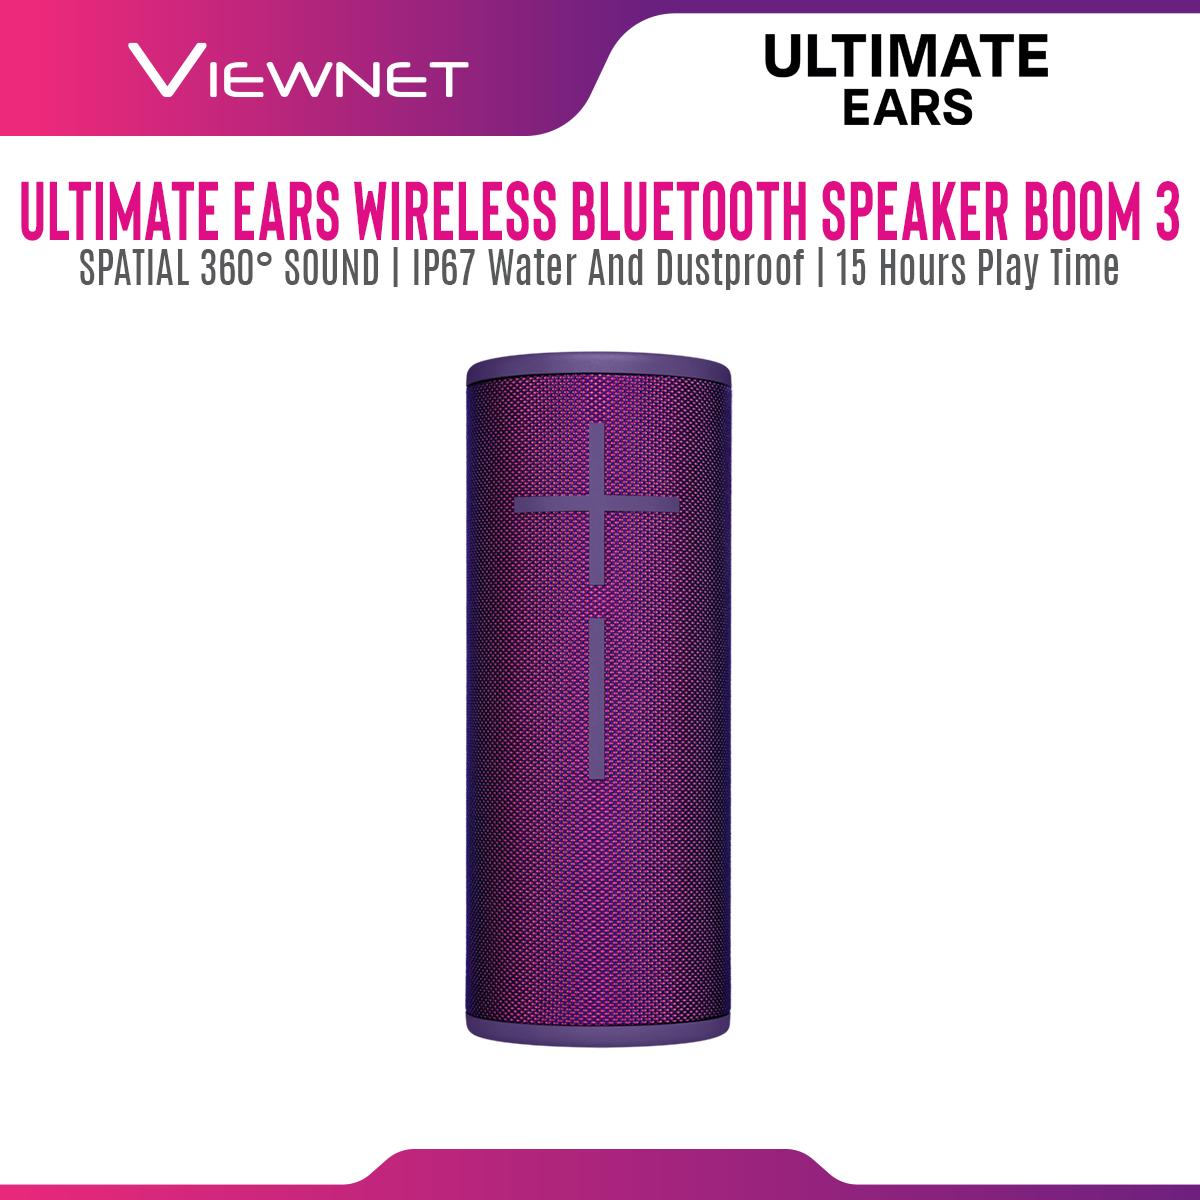 Ultimate Ears UE BOOM 3 Super Portable Waterproof Wireless Bluetooth Speaker (Lagoon Blue/Night Black/Sunset Red/Ultraviolet Purple)